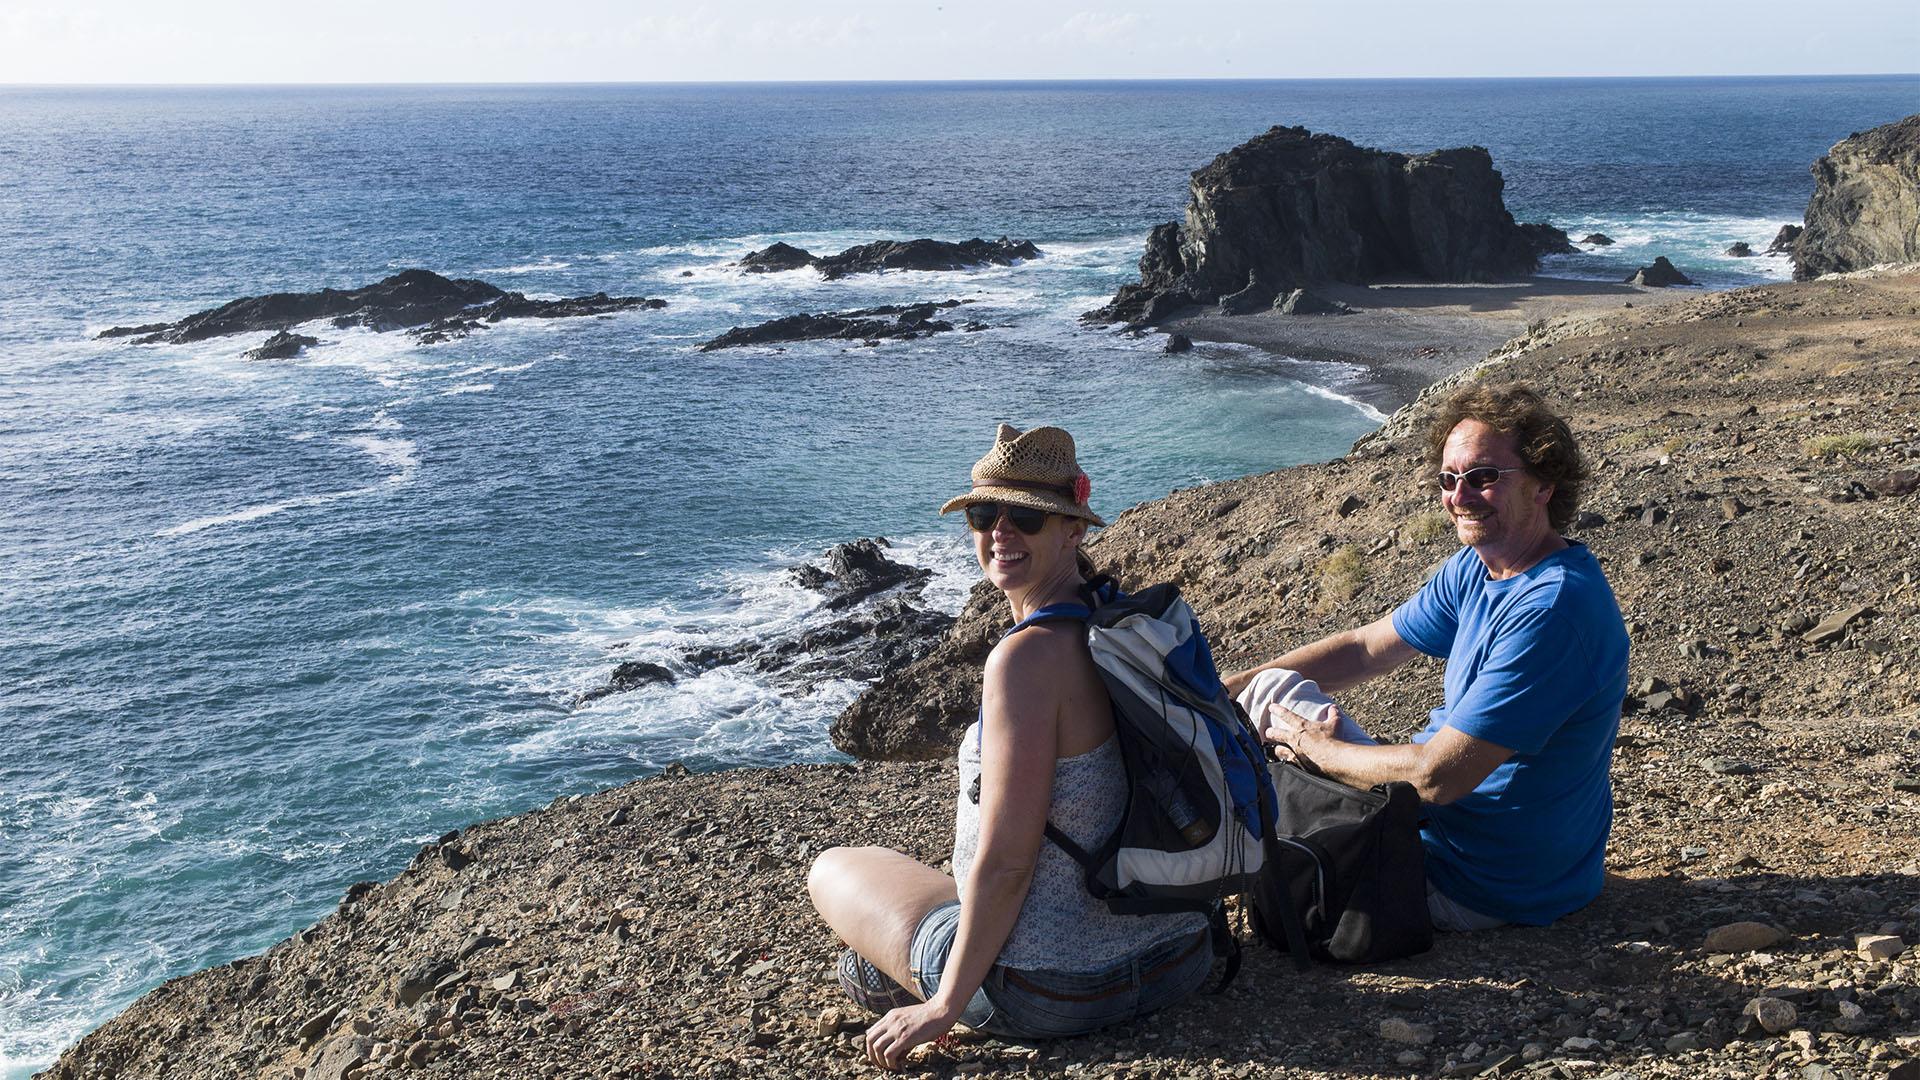 Wandern von Vega de Río Palmas nach Ajuy Fuerteventura.